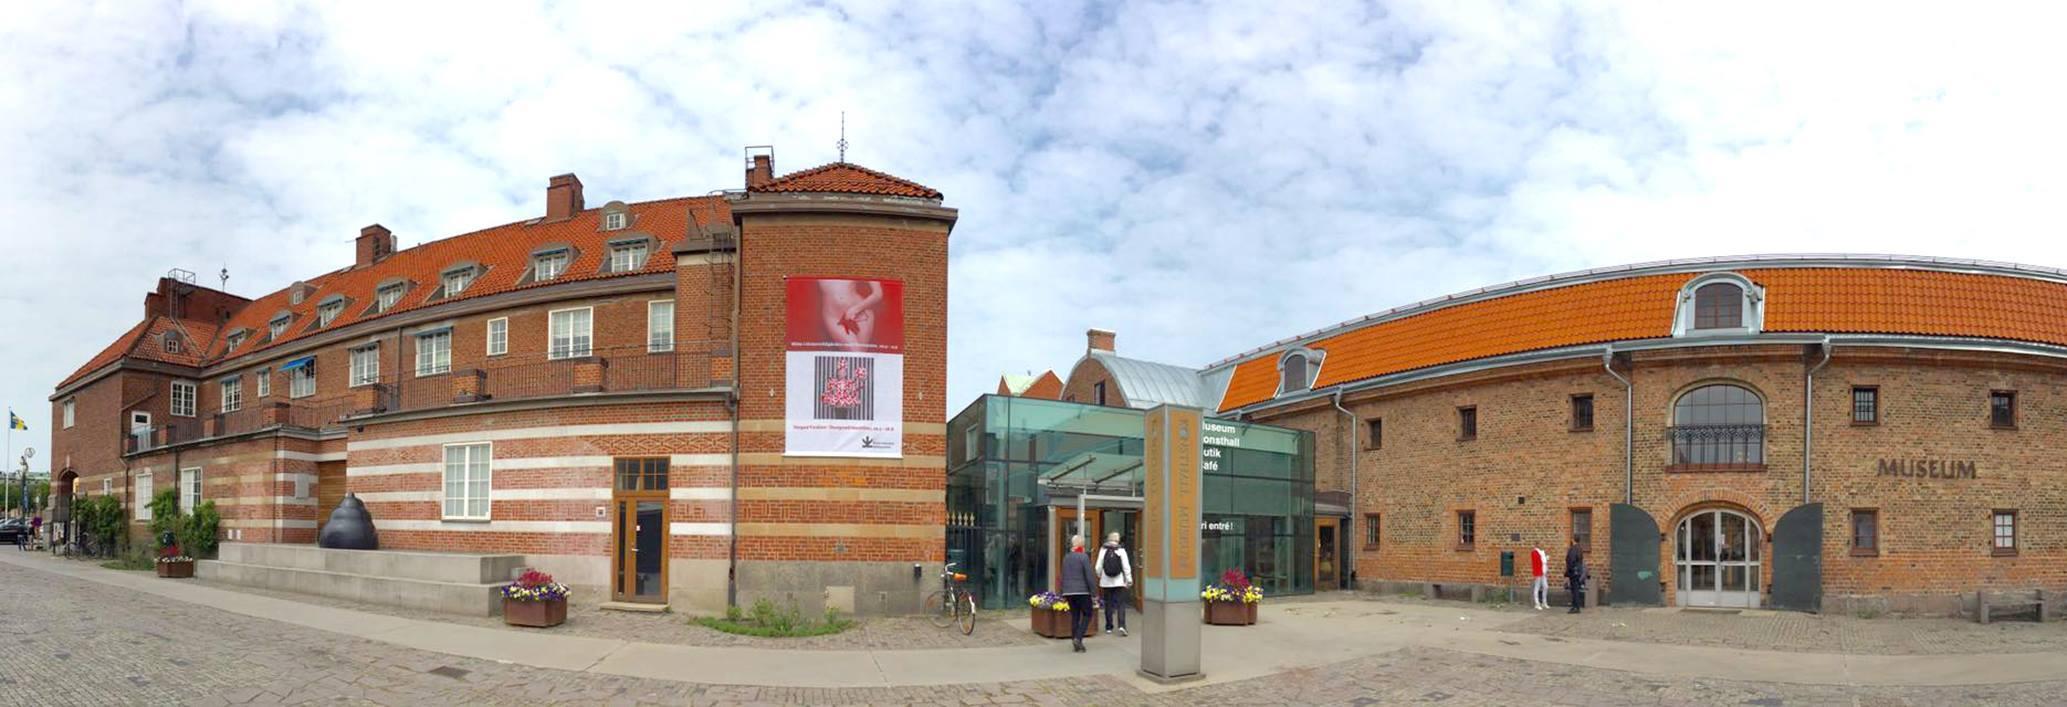 TheRegionalMuseumKristianstad-SarvenazDezvareh